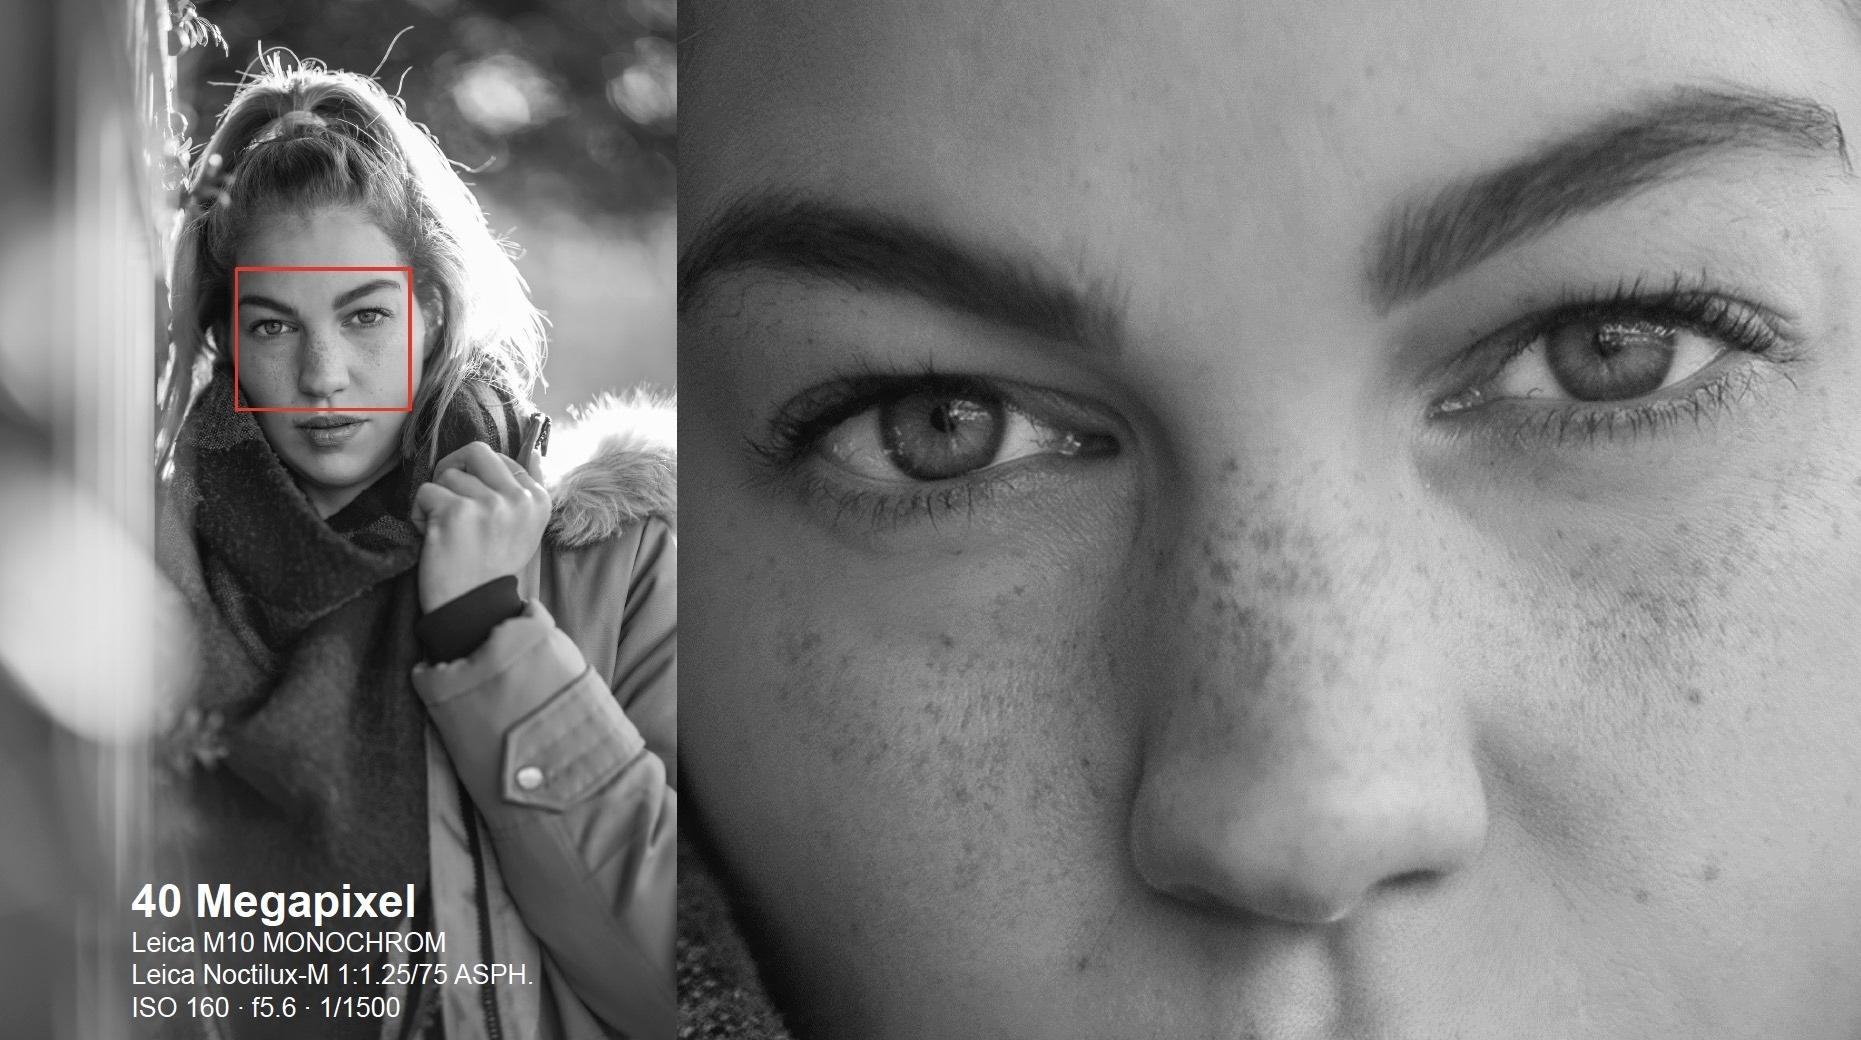 Leica M10 Monochrom 40mp resolution